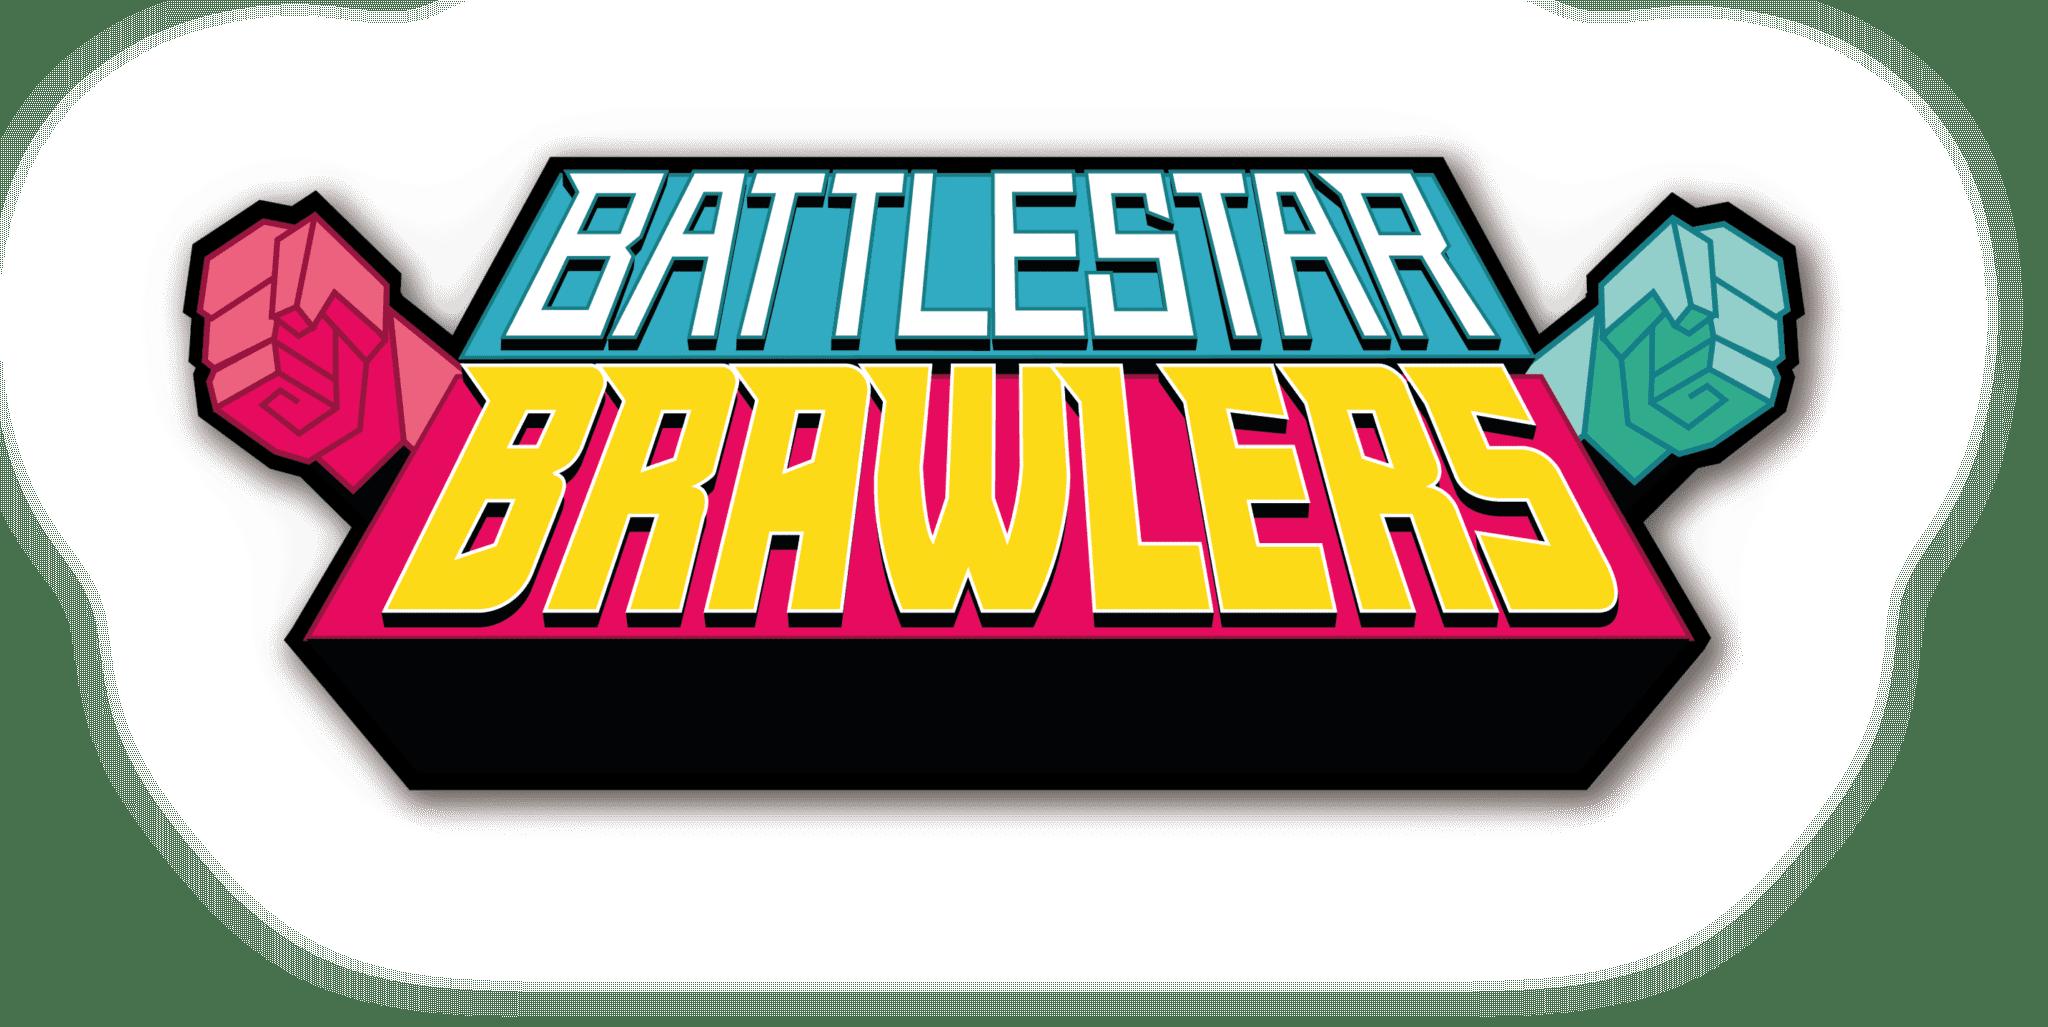 Our Brands - Battlestar Brawlers